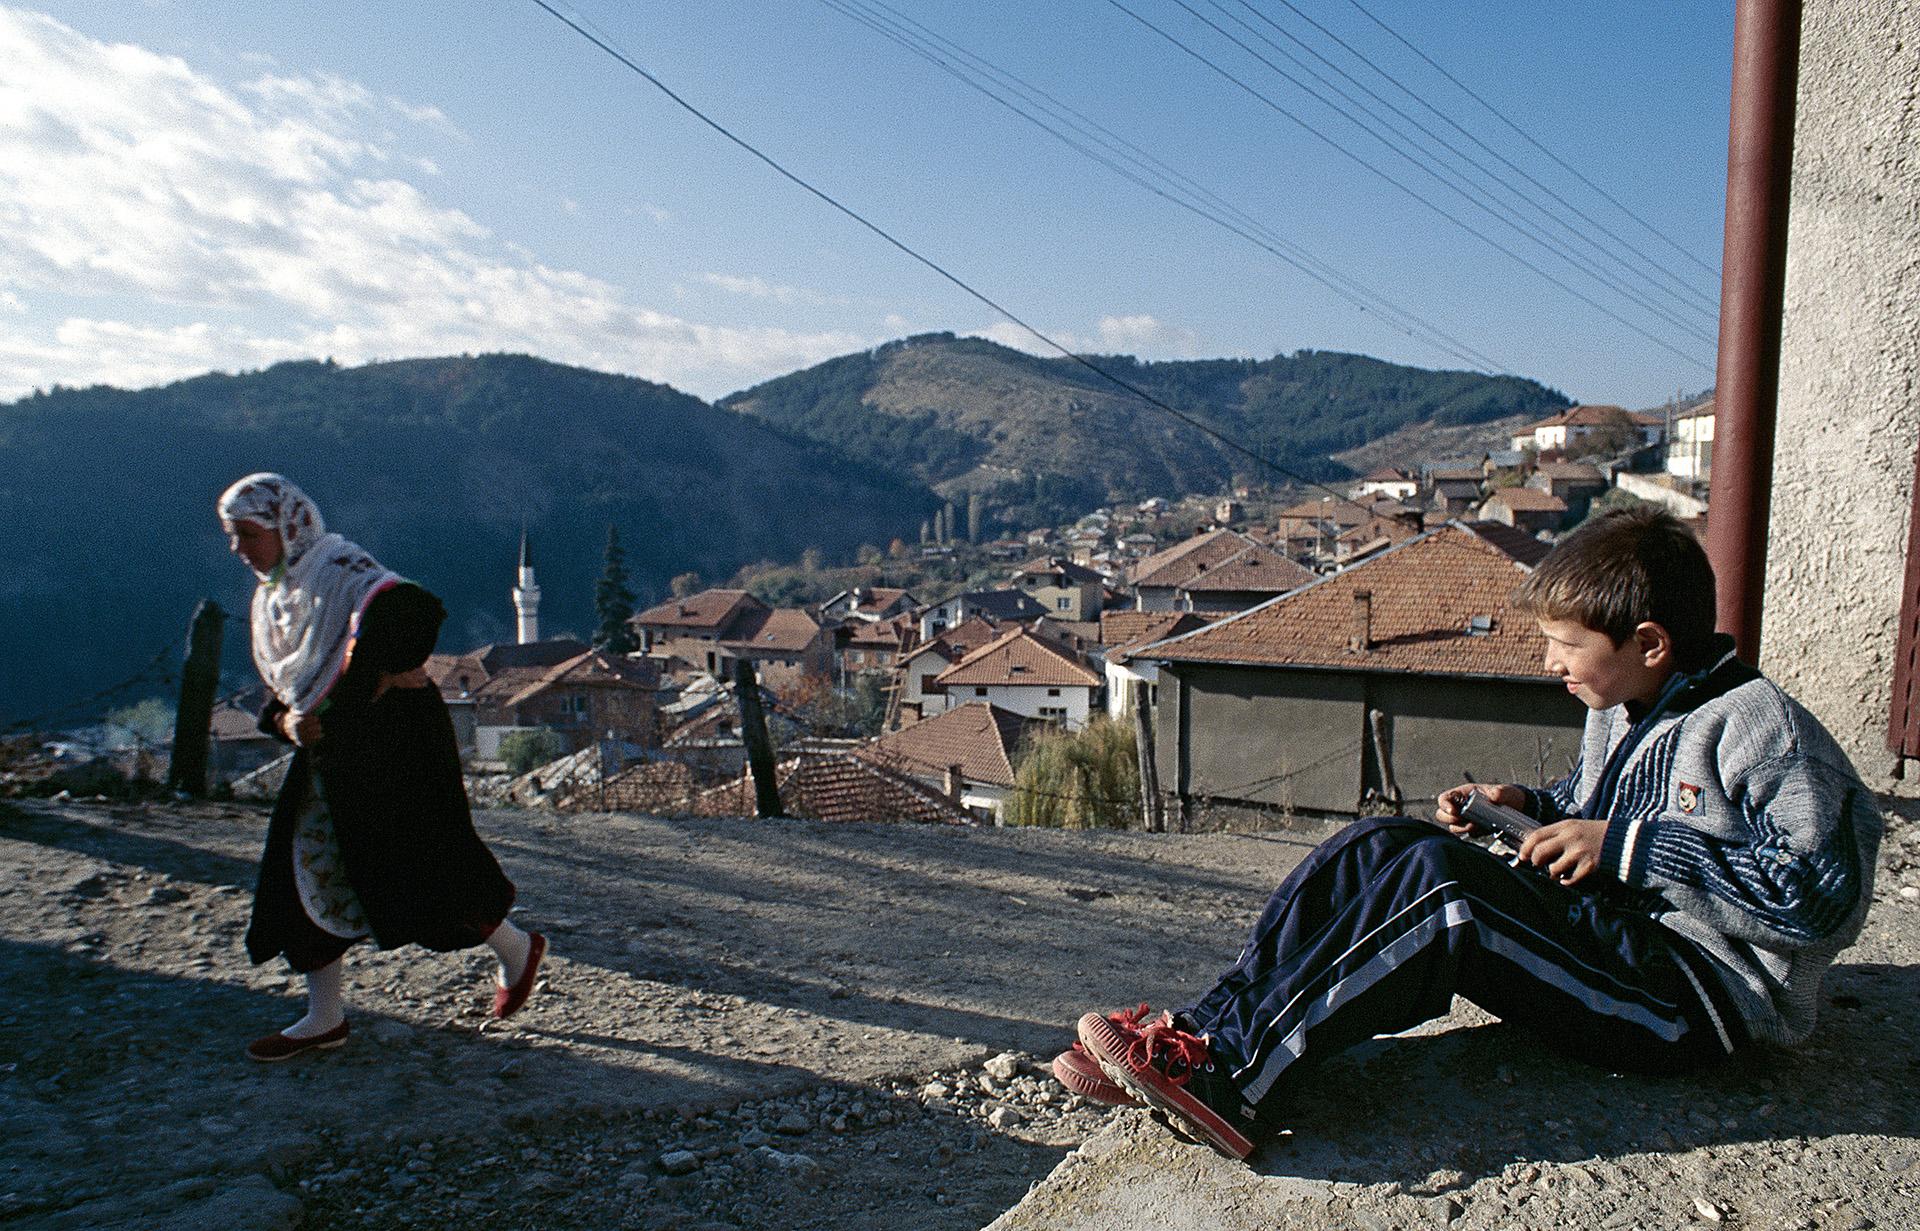 Ribnovo, Bulgaria03